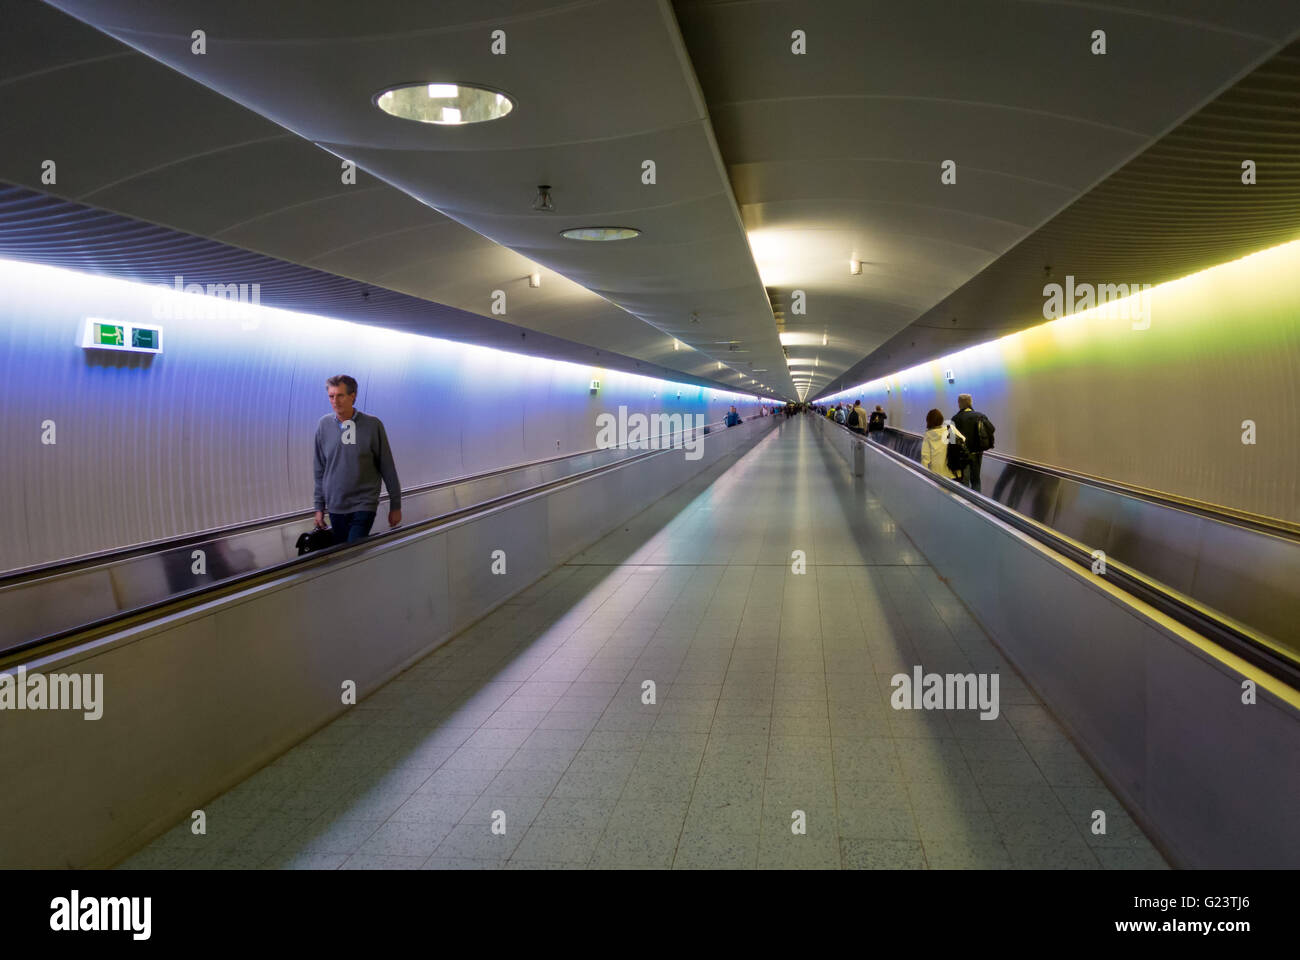 Transfer passengers on moving walkways or travelators at Frankfurt Airport, Germany.  Flughafen Frankfurt am Main. - Stock Image